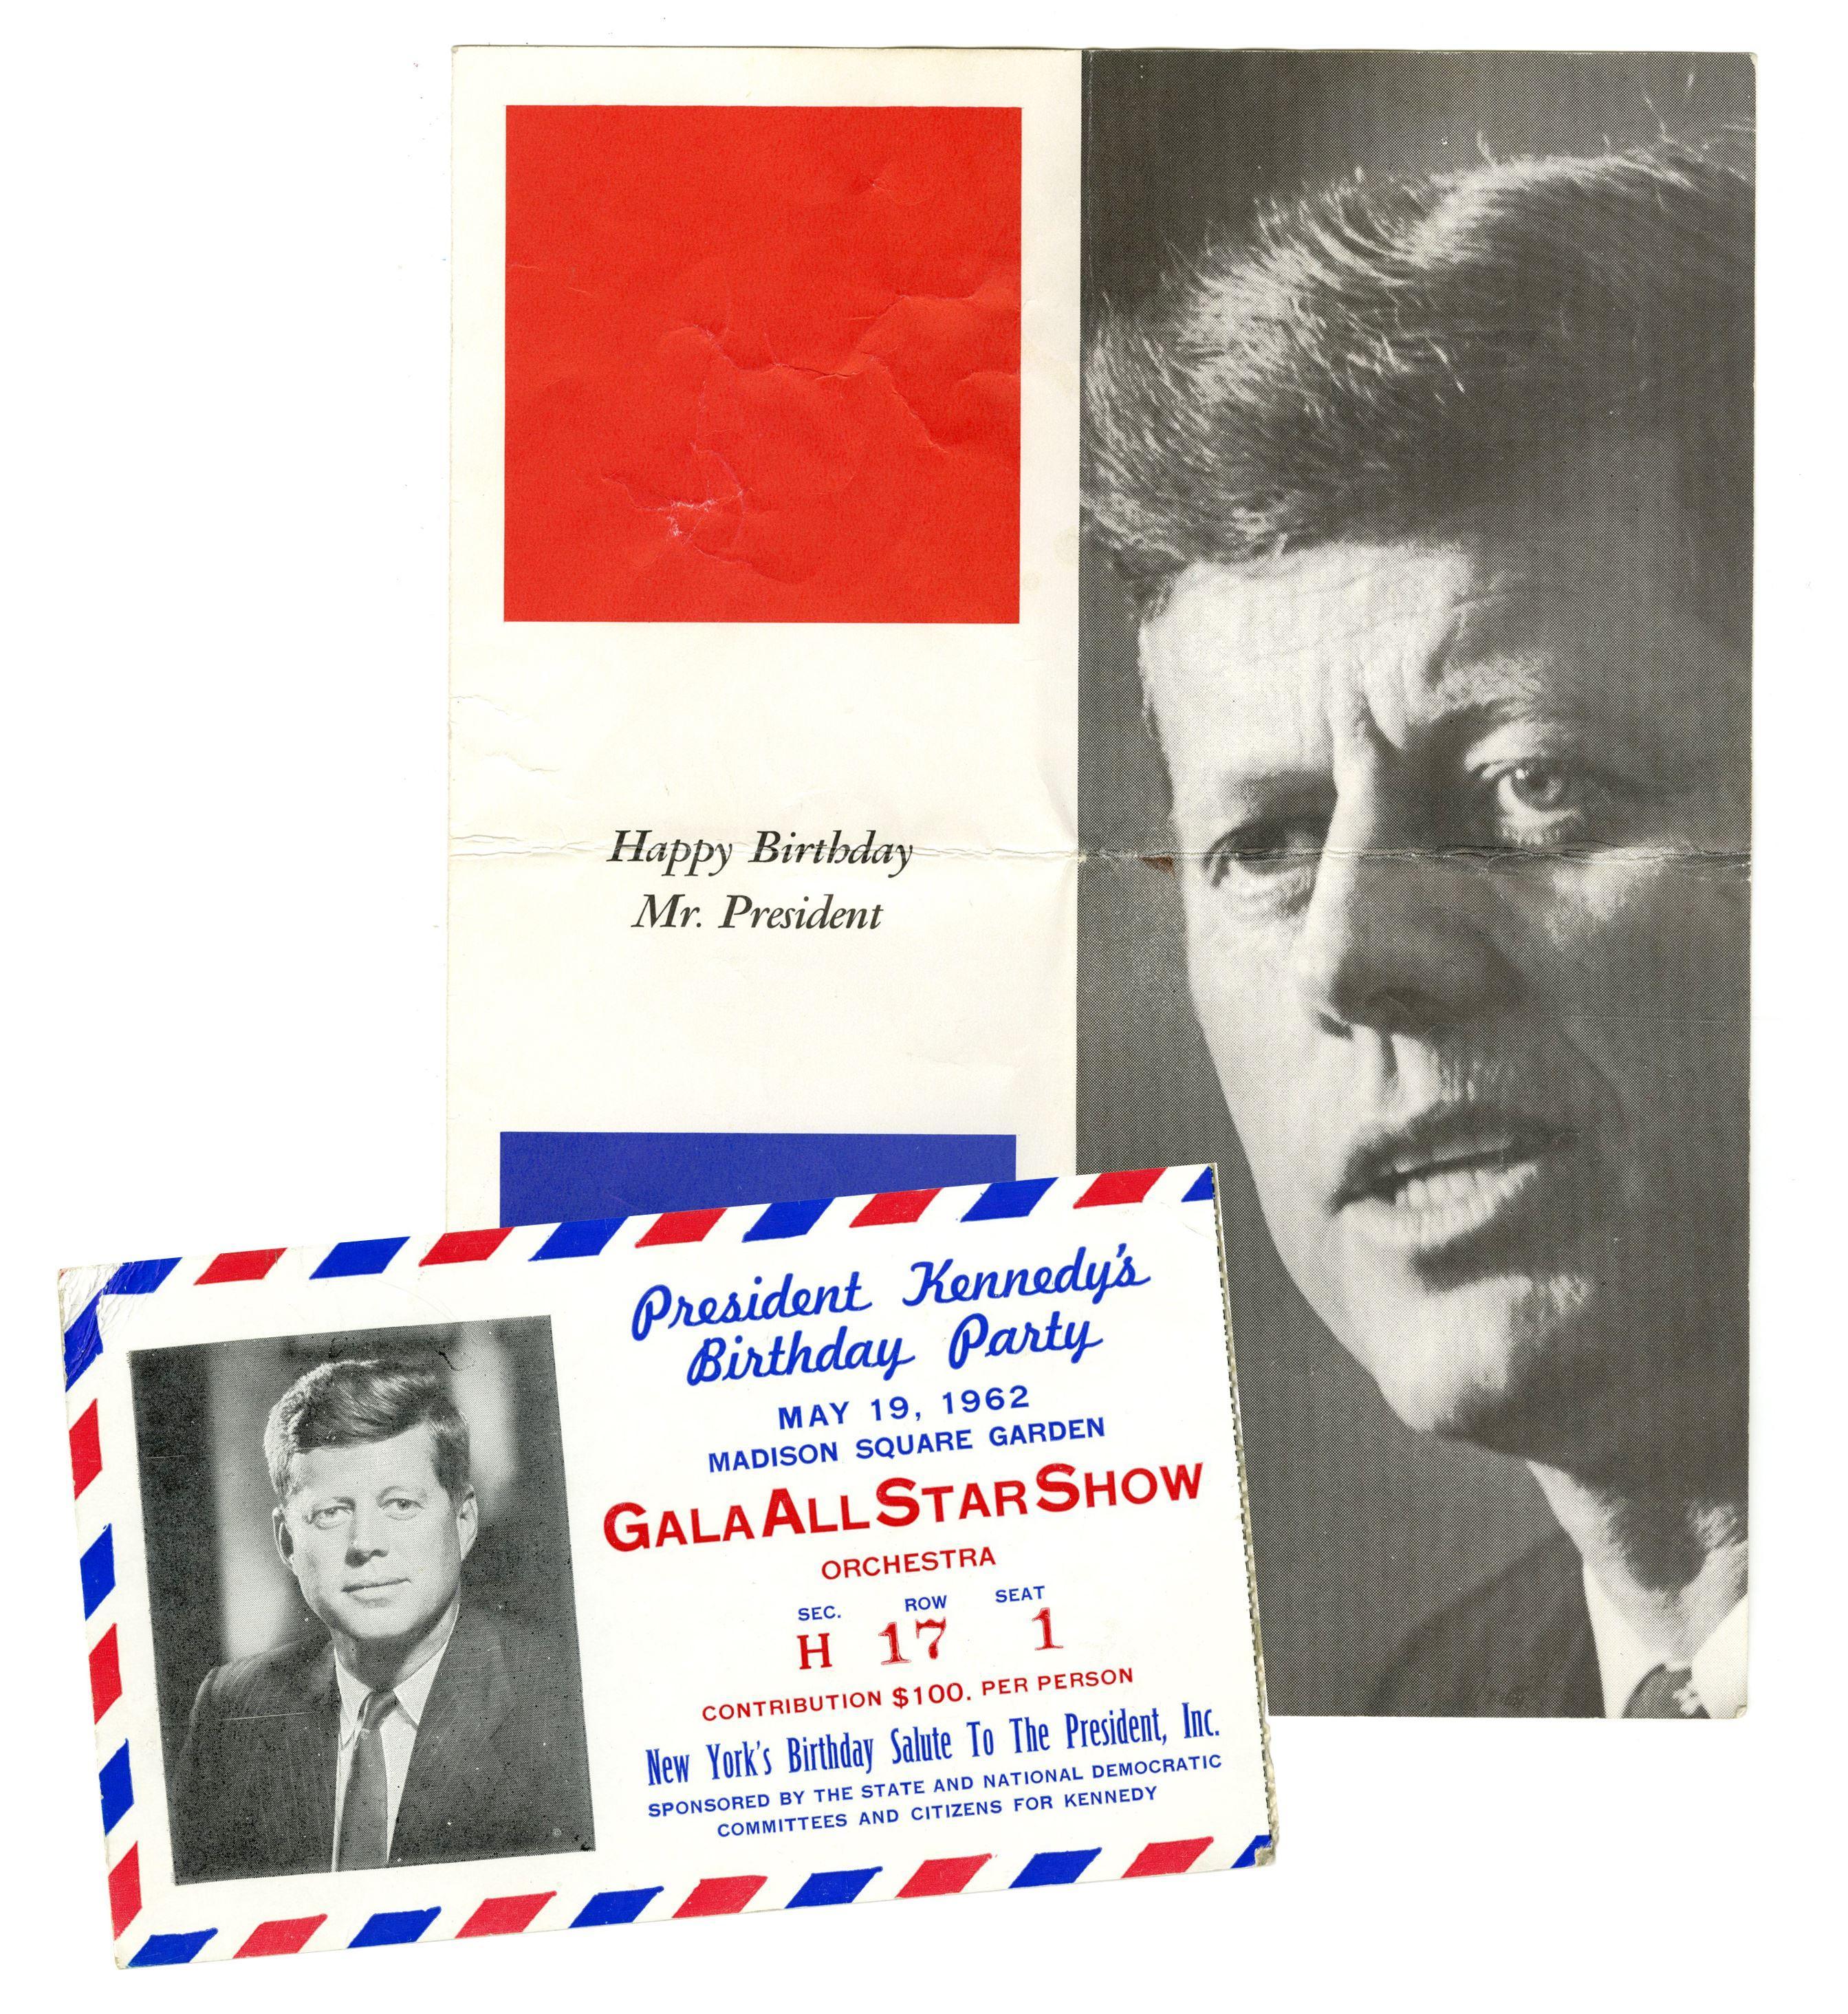 JFK and Marilyn Monroe Rare Birthday Celebration Ticket and Program